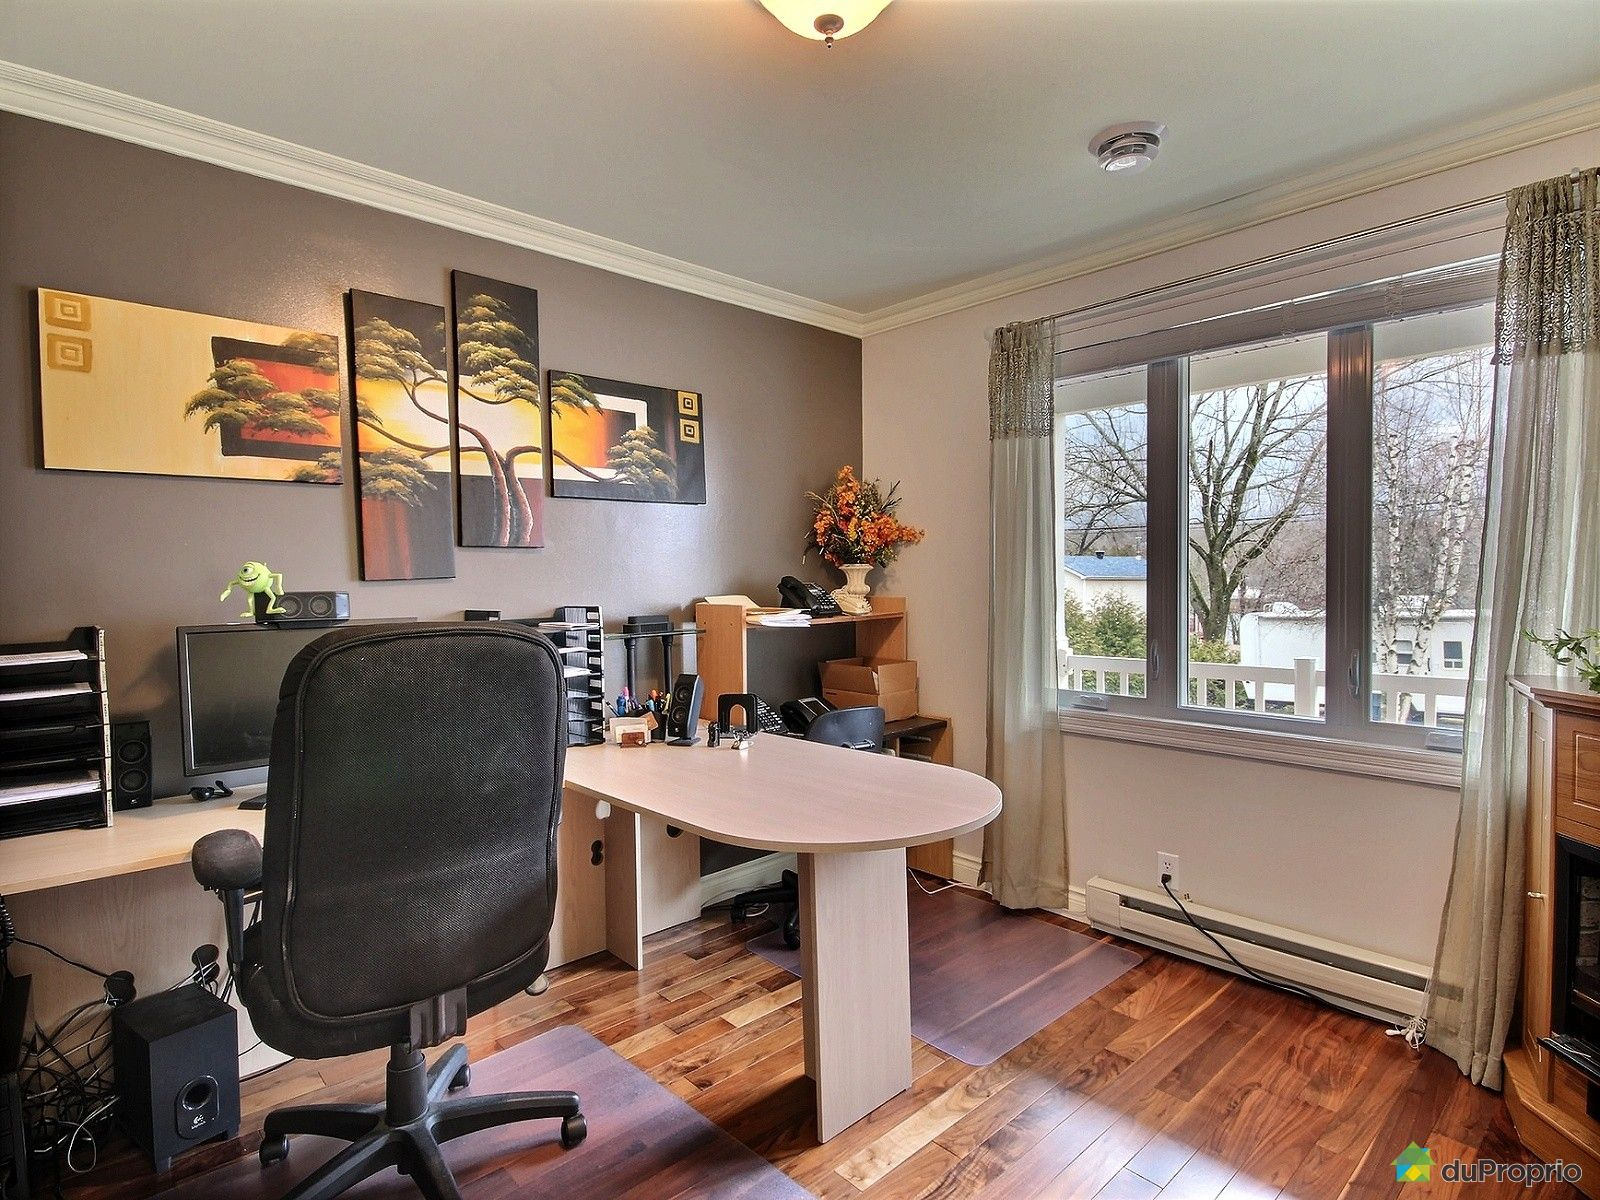 maison vendre sherbrooke 4452 boulevard de l 39 universit immobilier qu bec duproprio 696719. Black Bedroom Furniture Sets. Home Design Ideas